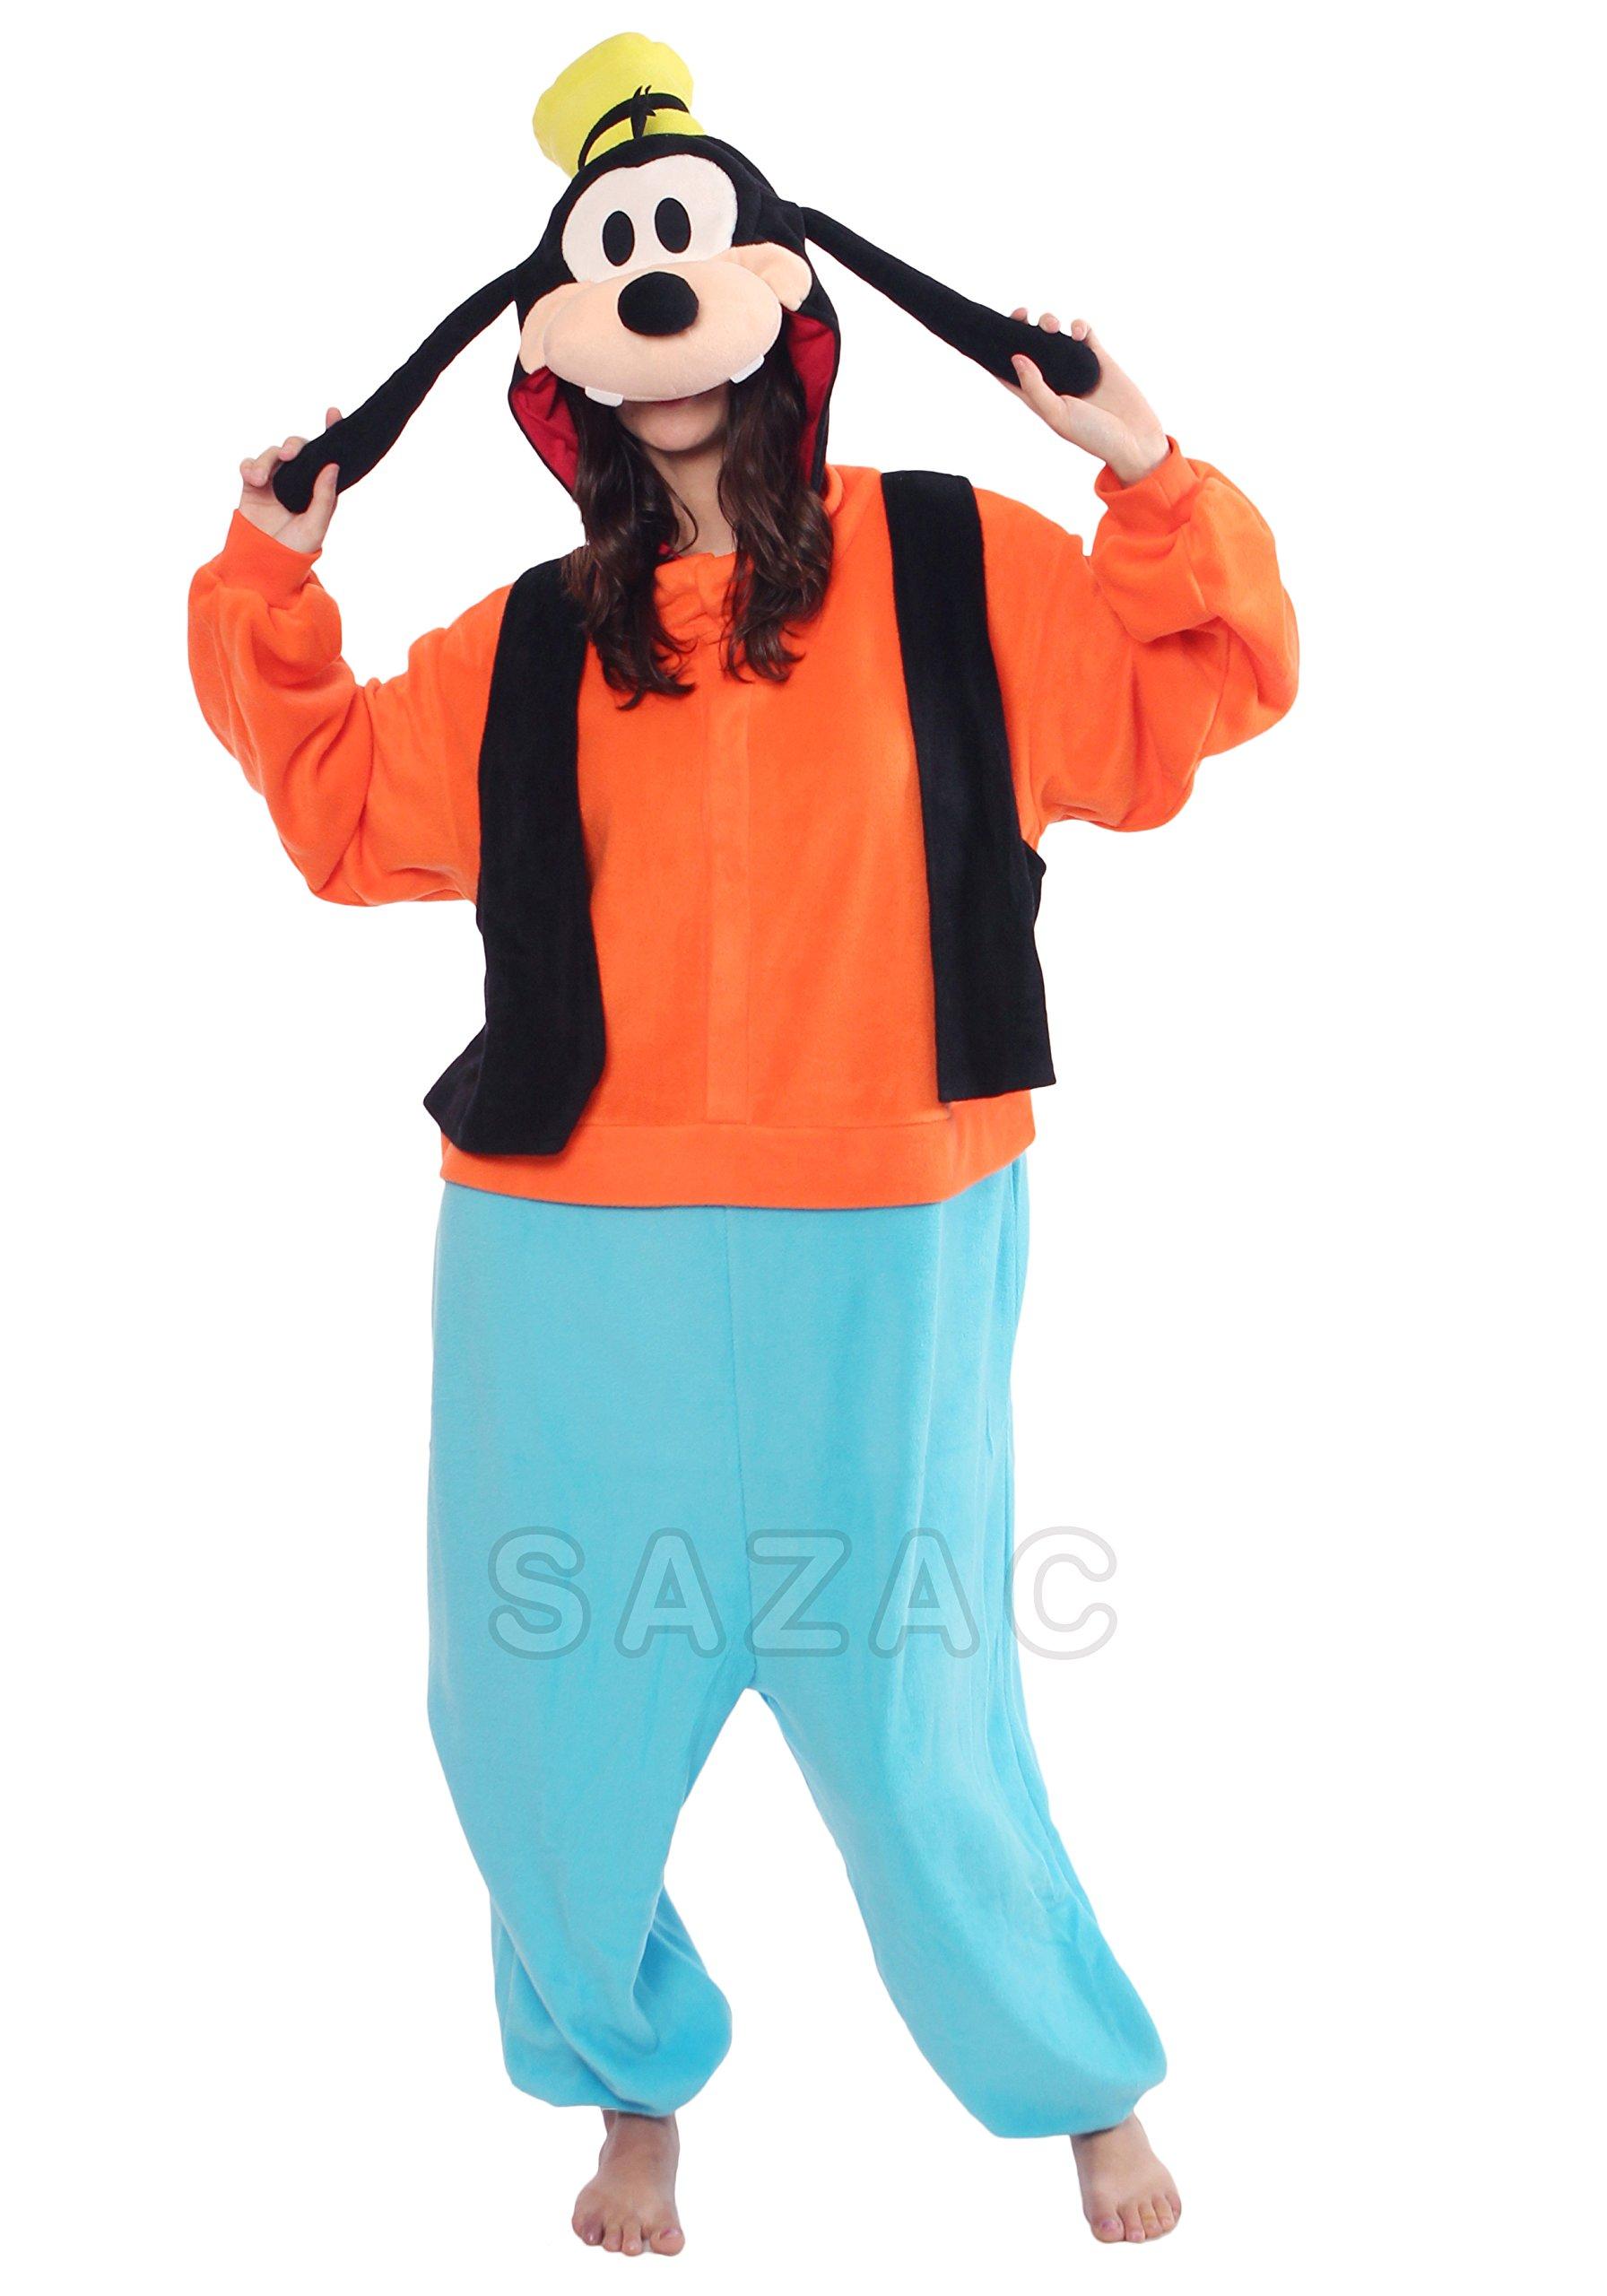 Goofy Pajama Costume Kigu